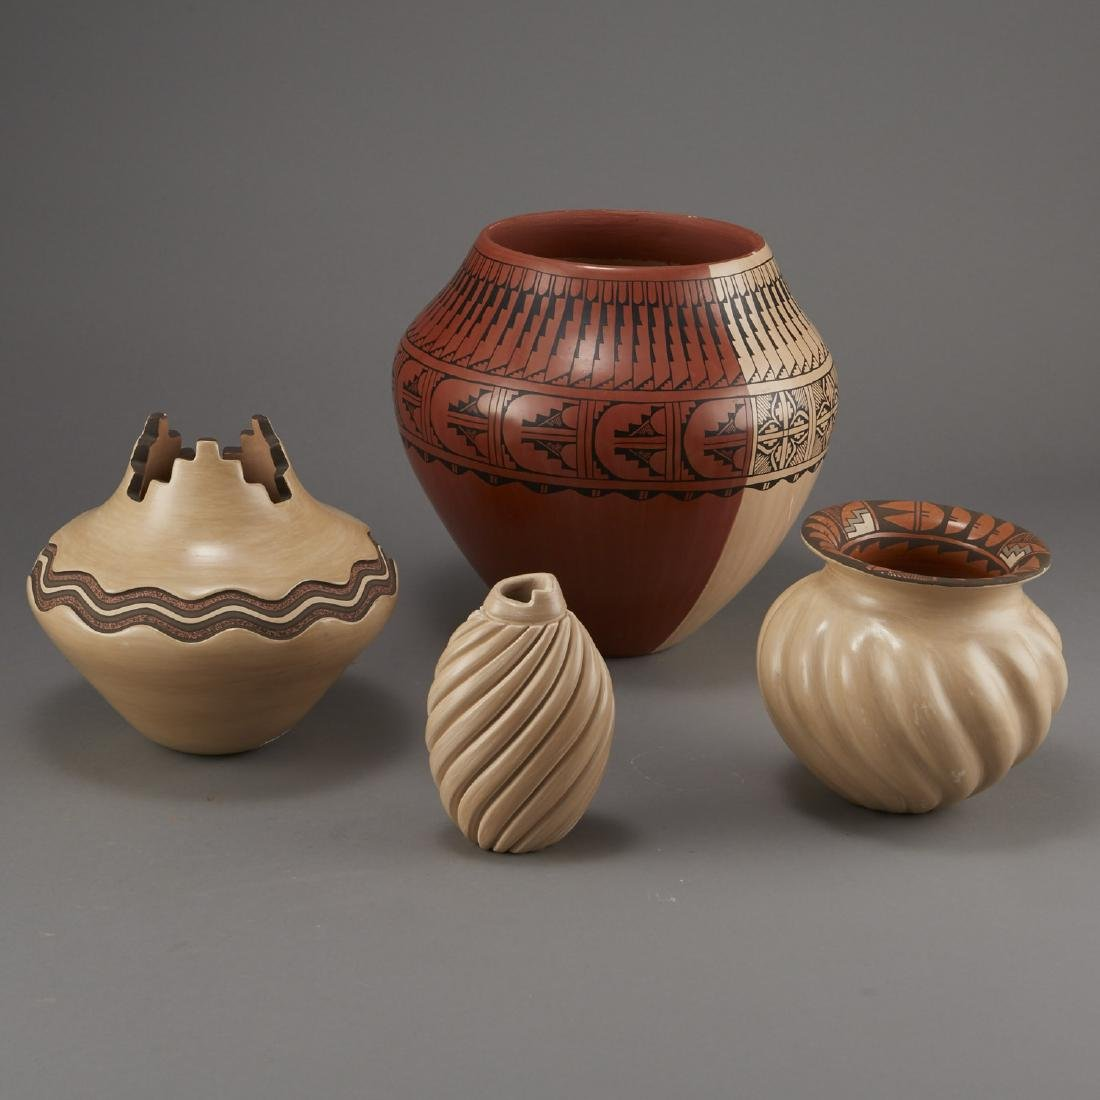 Group of Jemez Pottery Yepa and Fragua